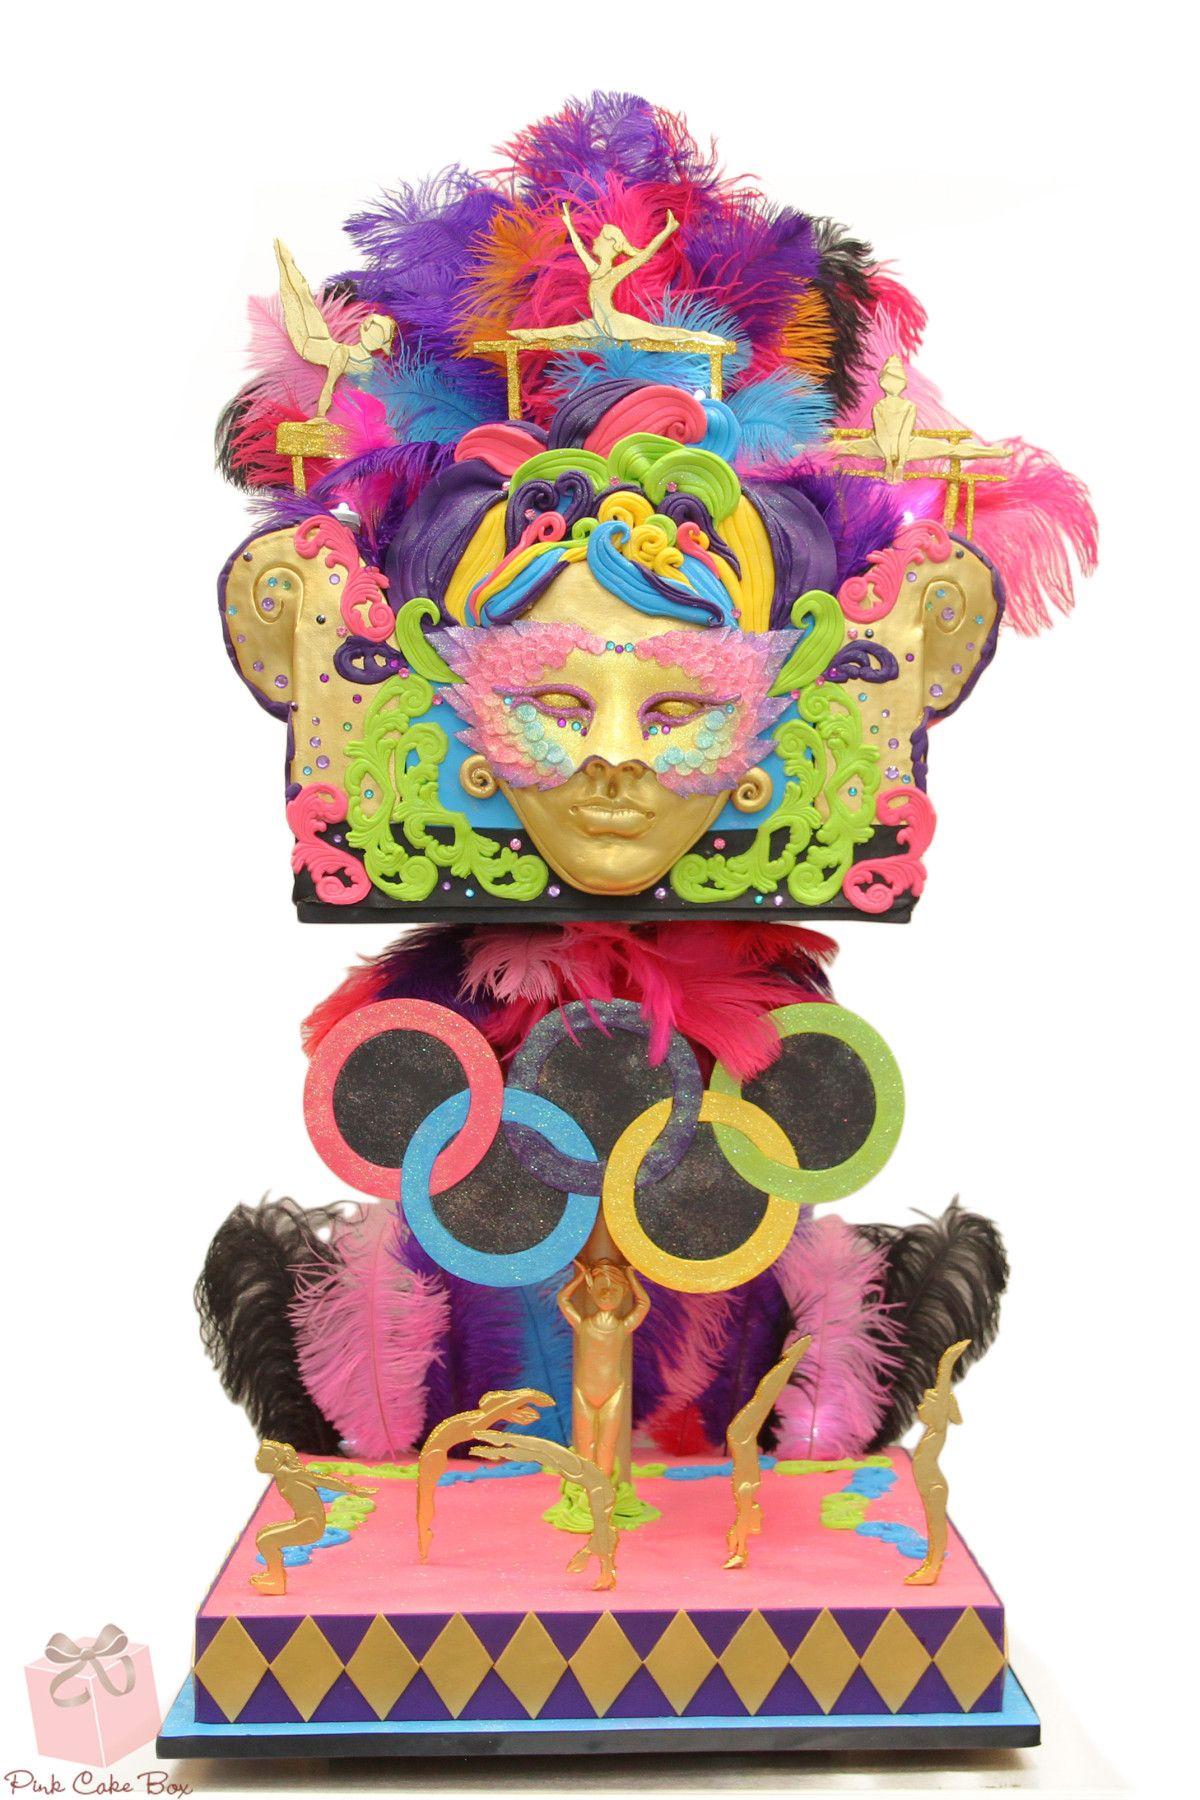 Carnival Toy Box Pink: Bat Mitvzah Brazilian Carnival Cake » Bat Mitzvah Cakes